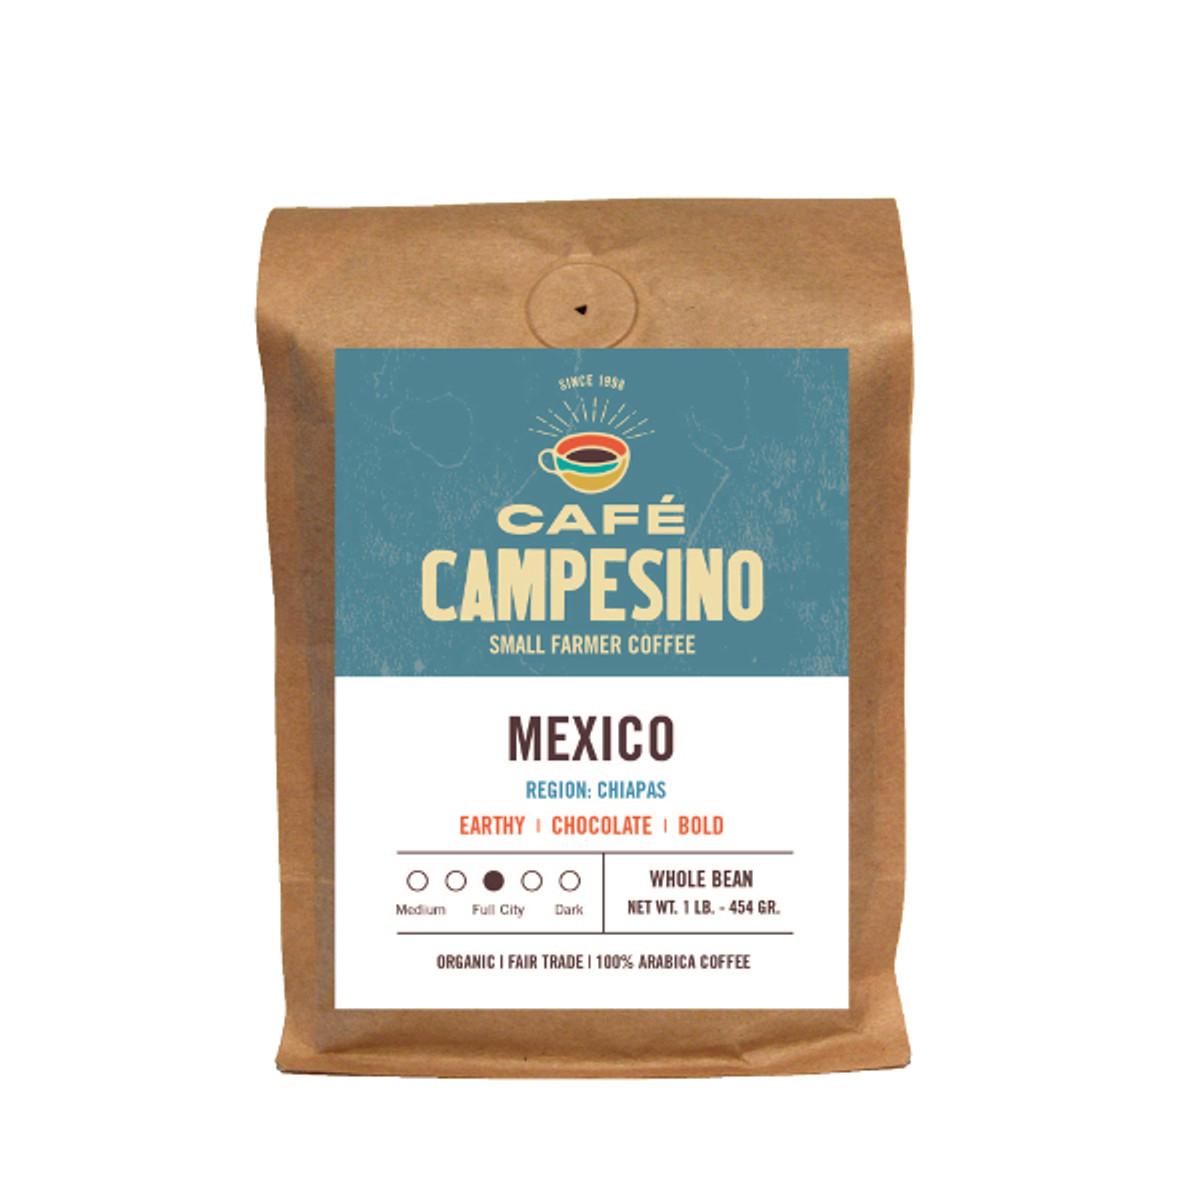 Fair trade, organic, shade-grown, arabica coffee from the Maya Vinic cooperative in Chiapas, Mexico